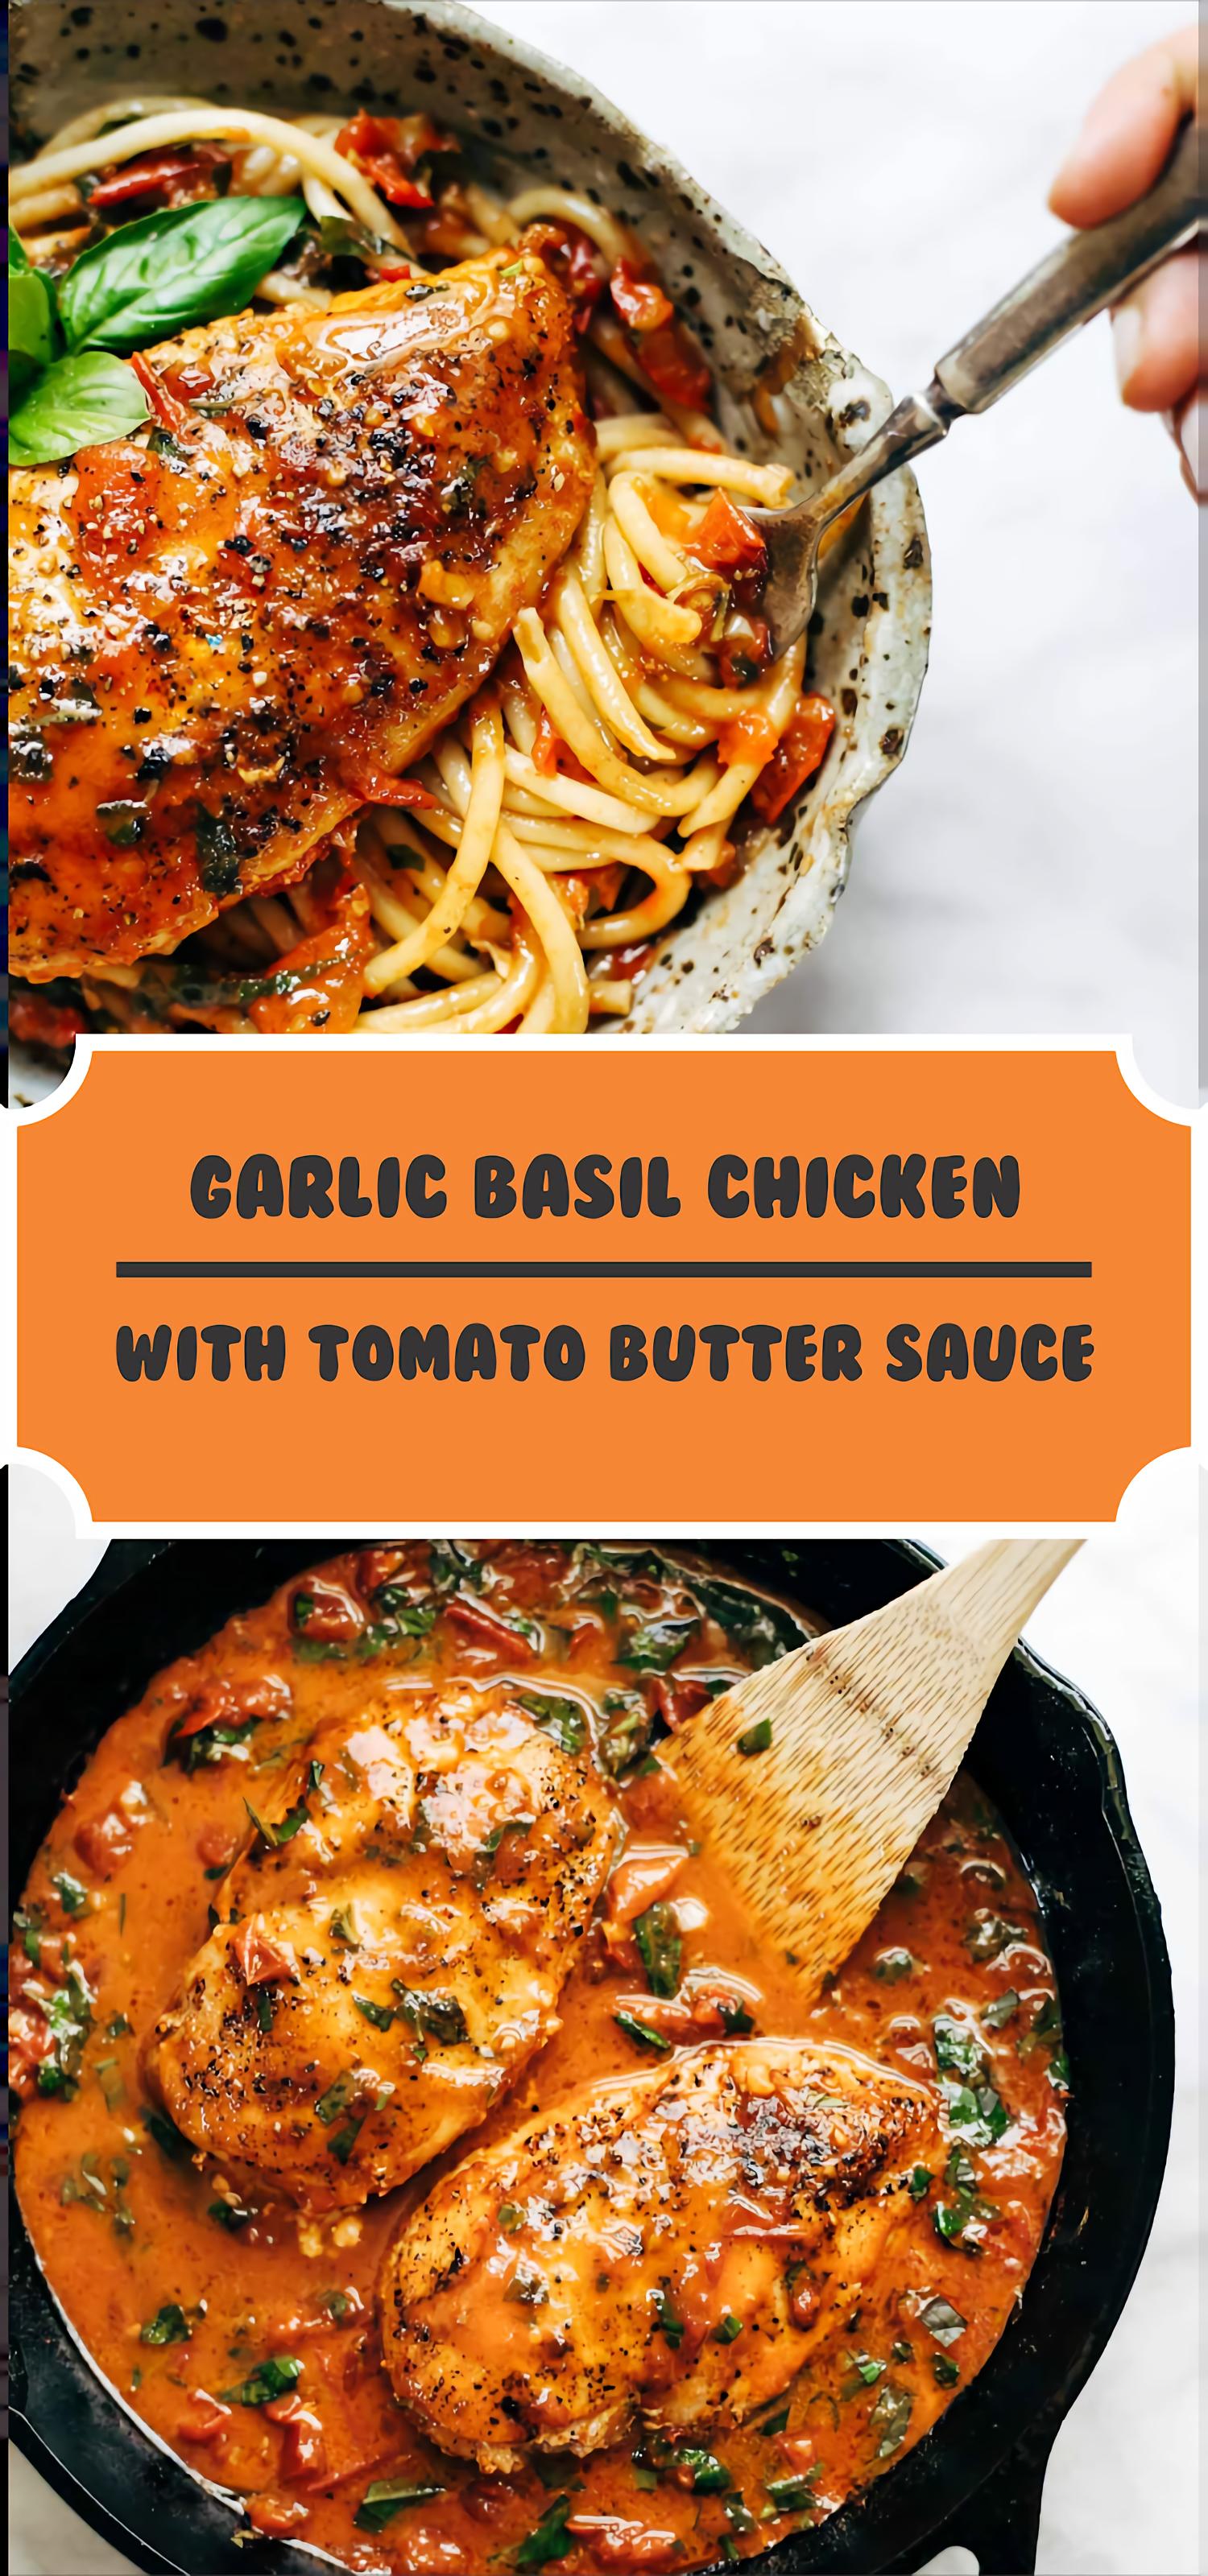 Garlic Basil Chicken with Tomato Butter Sauce #Chicken #Soup #chickenbreastrecipeseasy